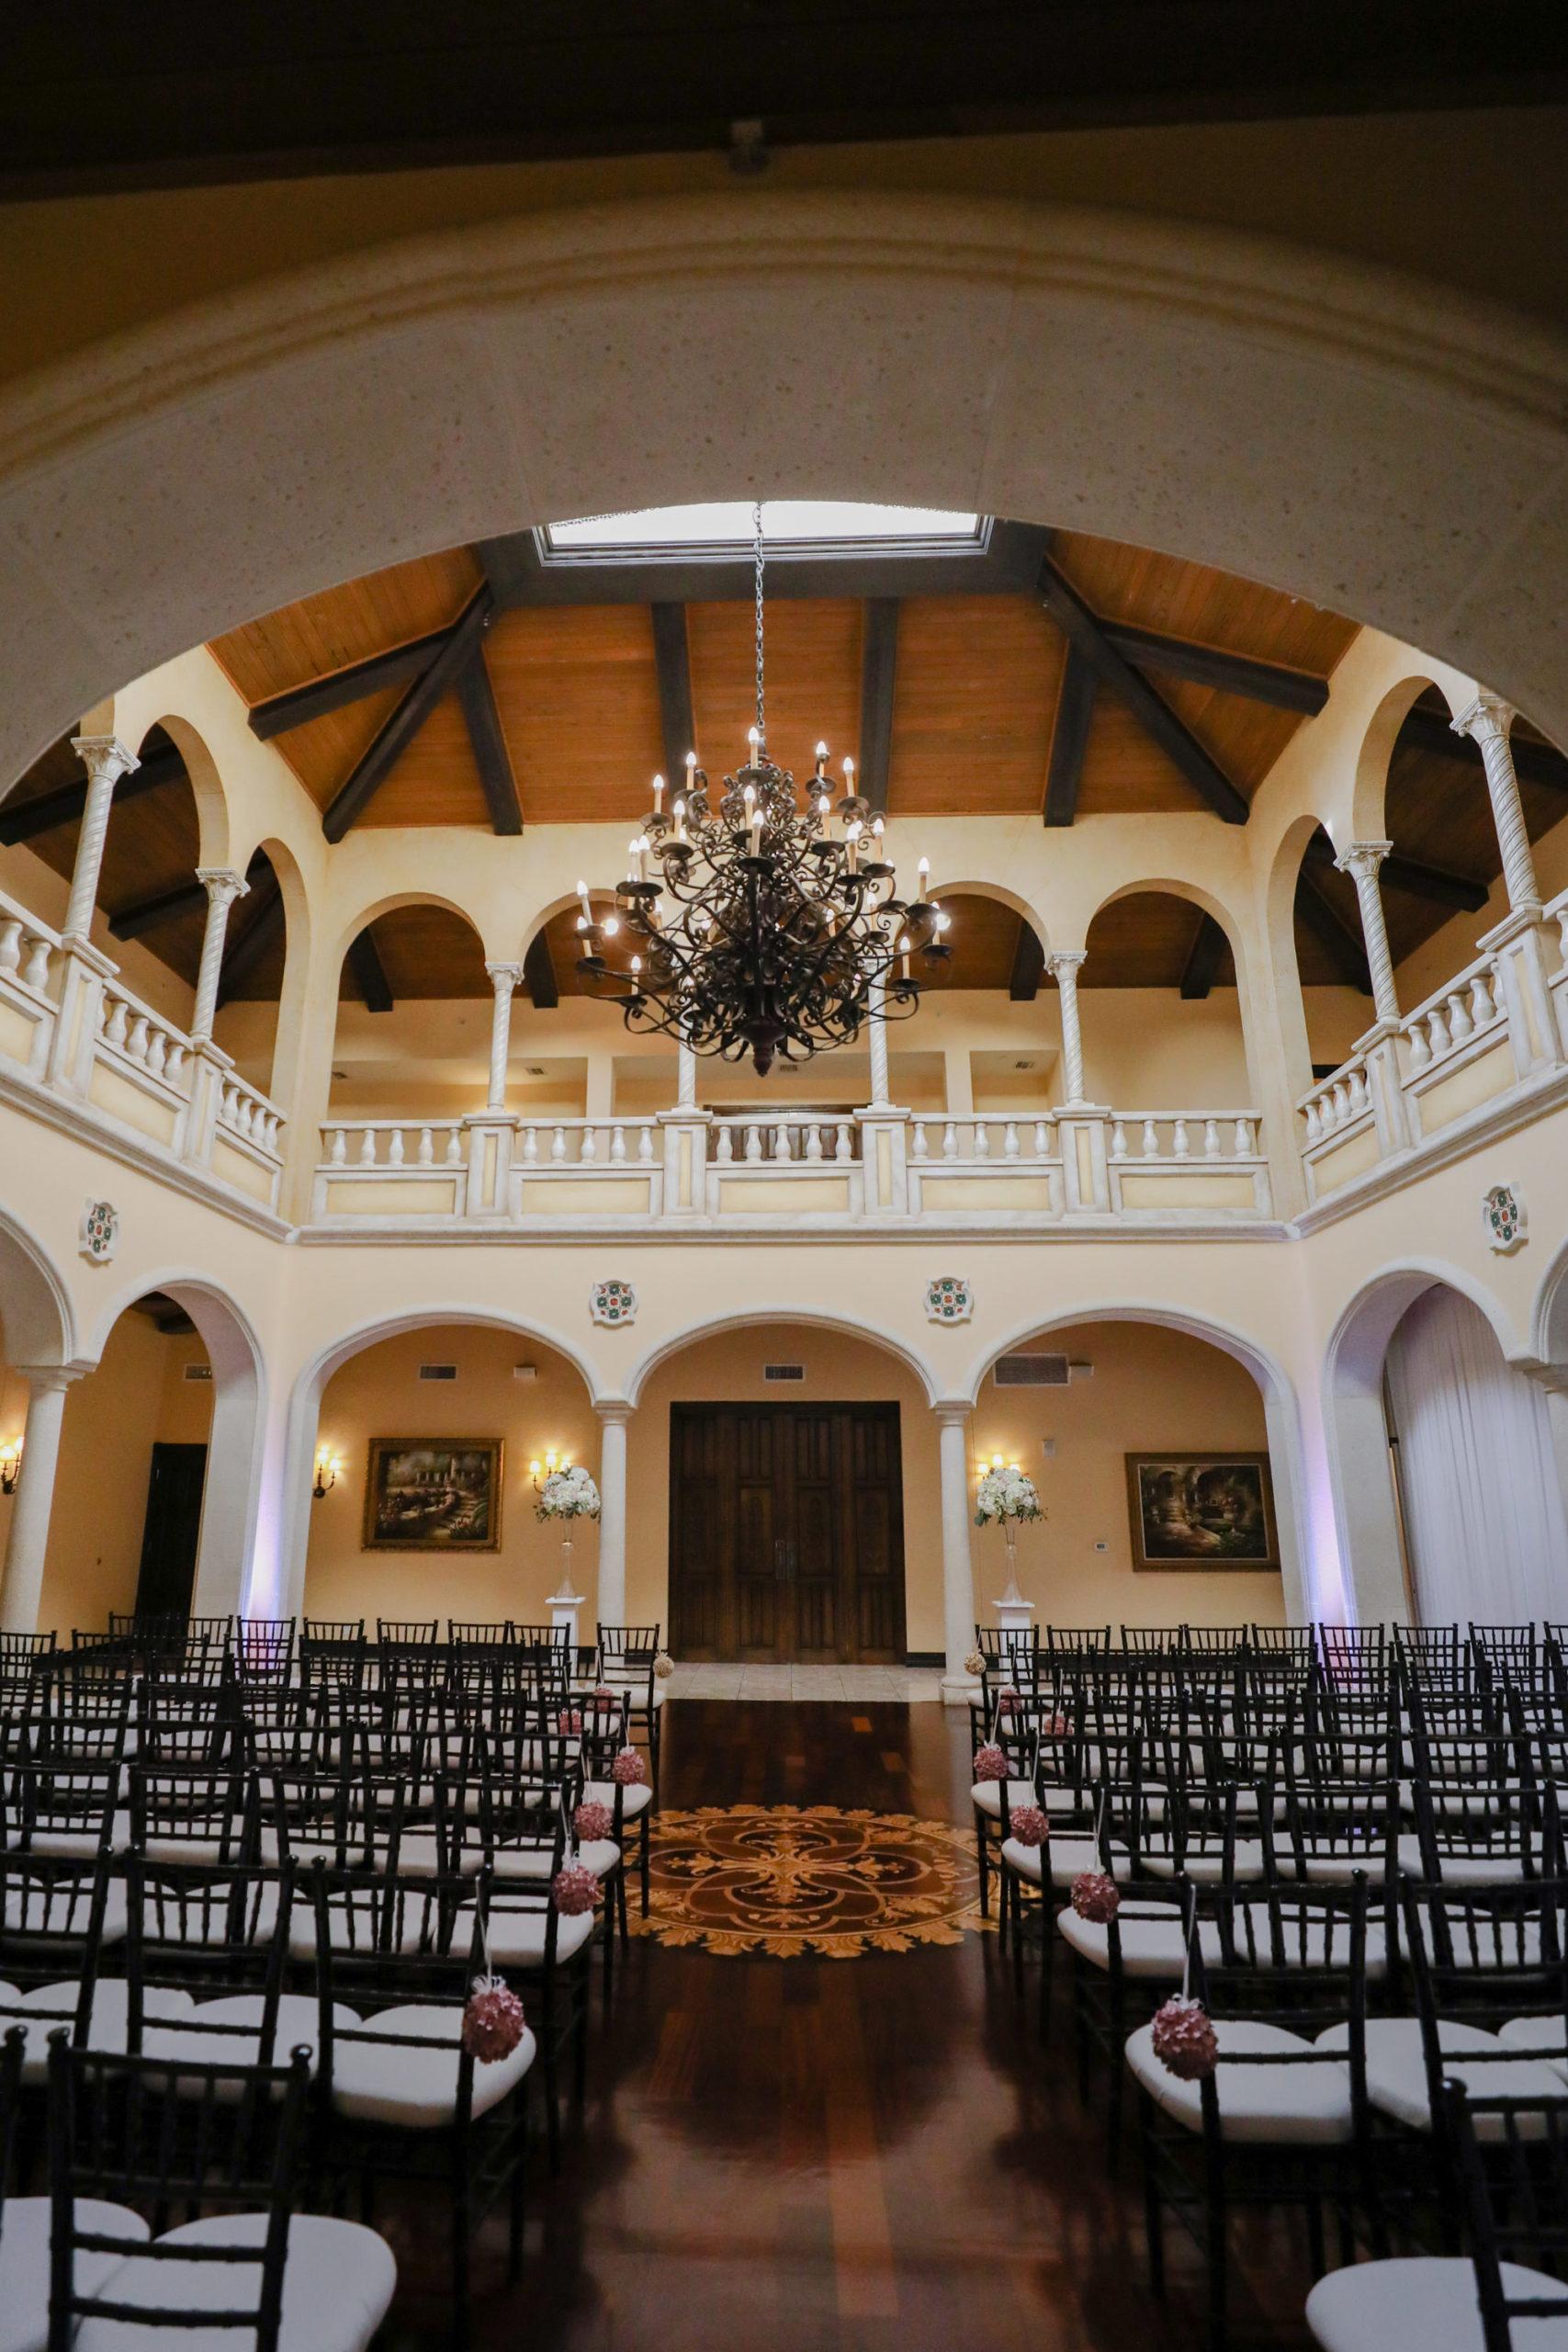 Indoor Ballroom Wedding Ceremony with Black Chiavari Chairs and Chandelier | Elegant Tampa Bay Wedding Venue Avila Golf & Country Club